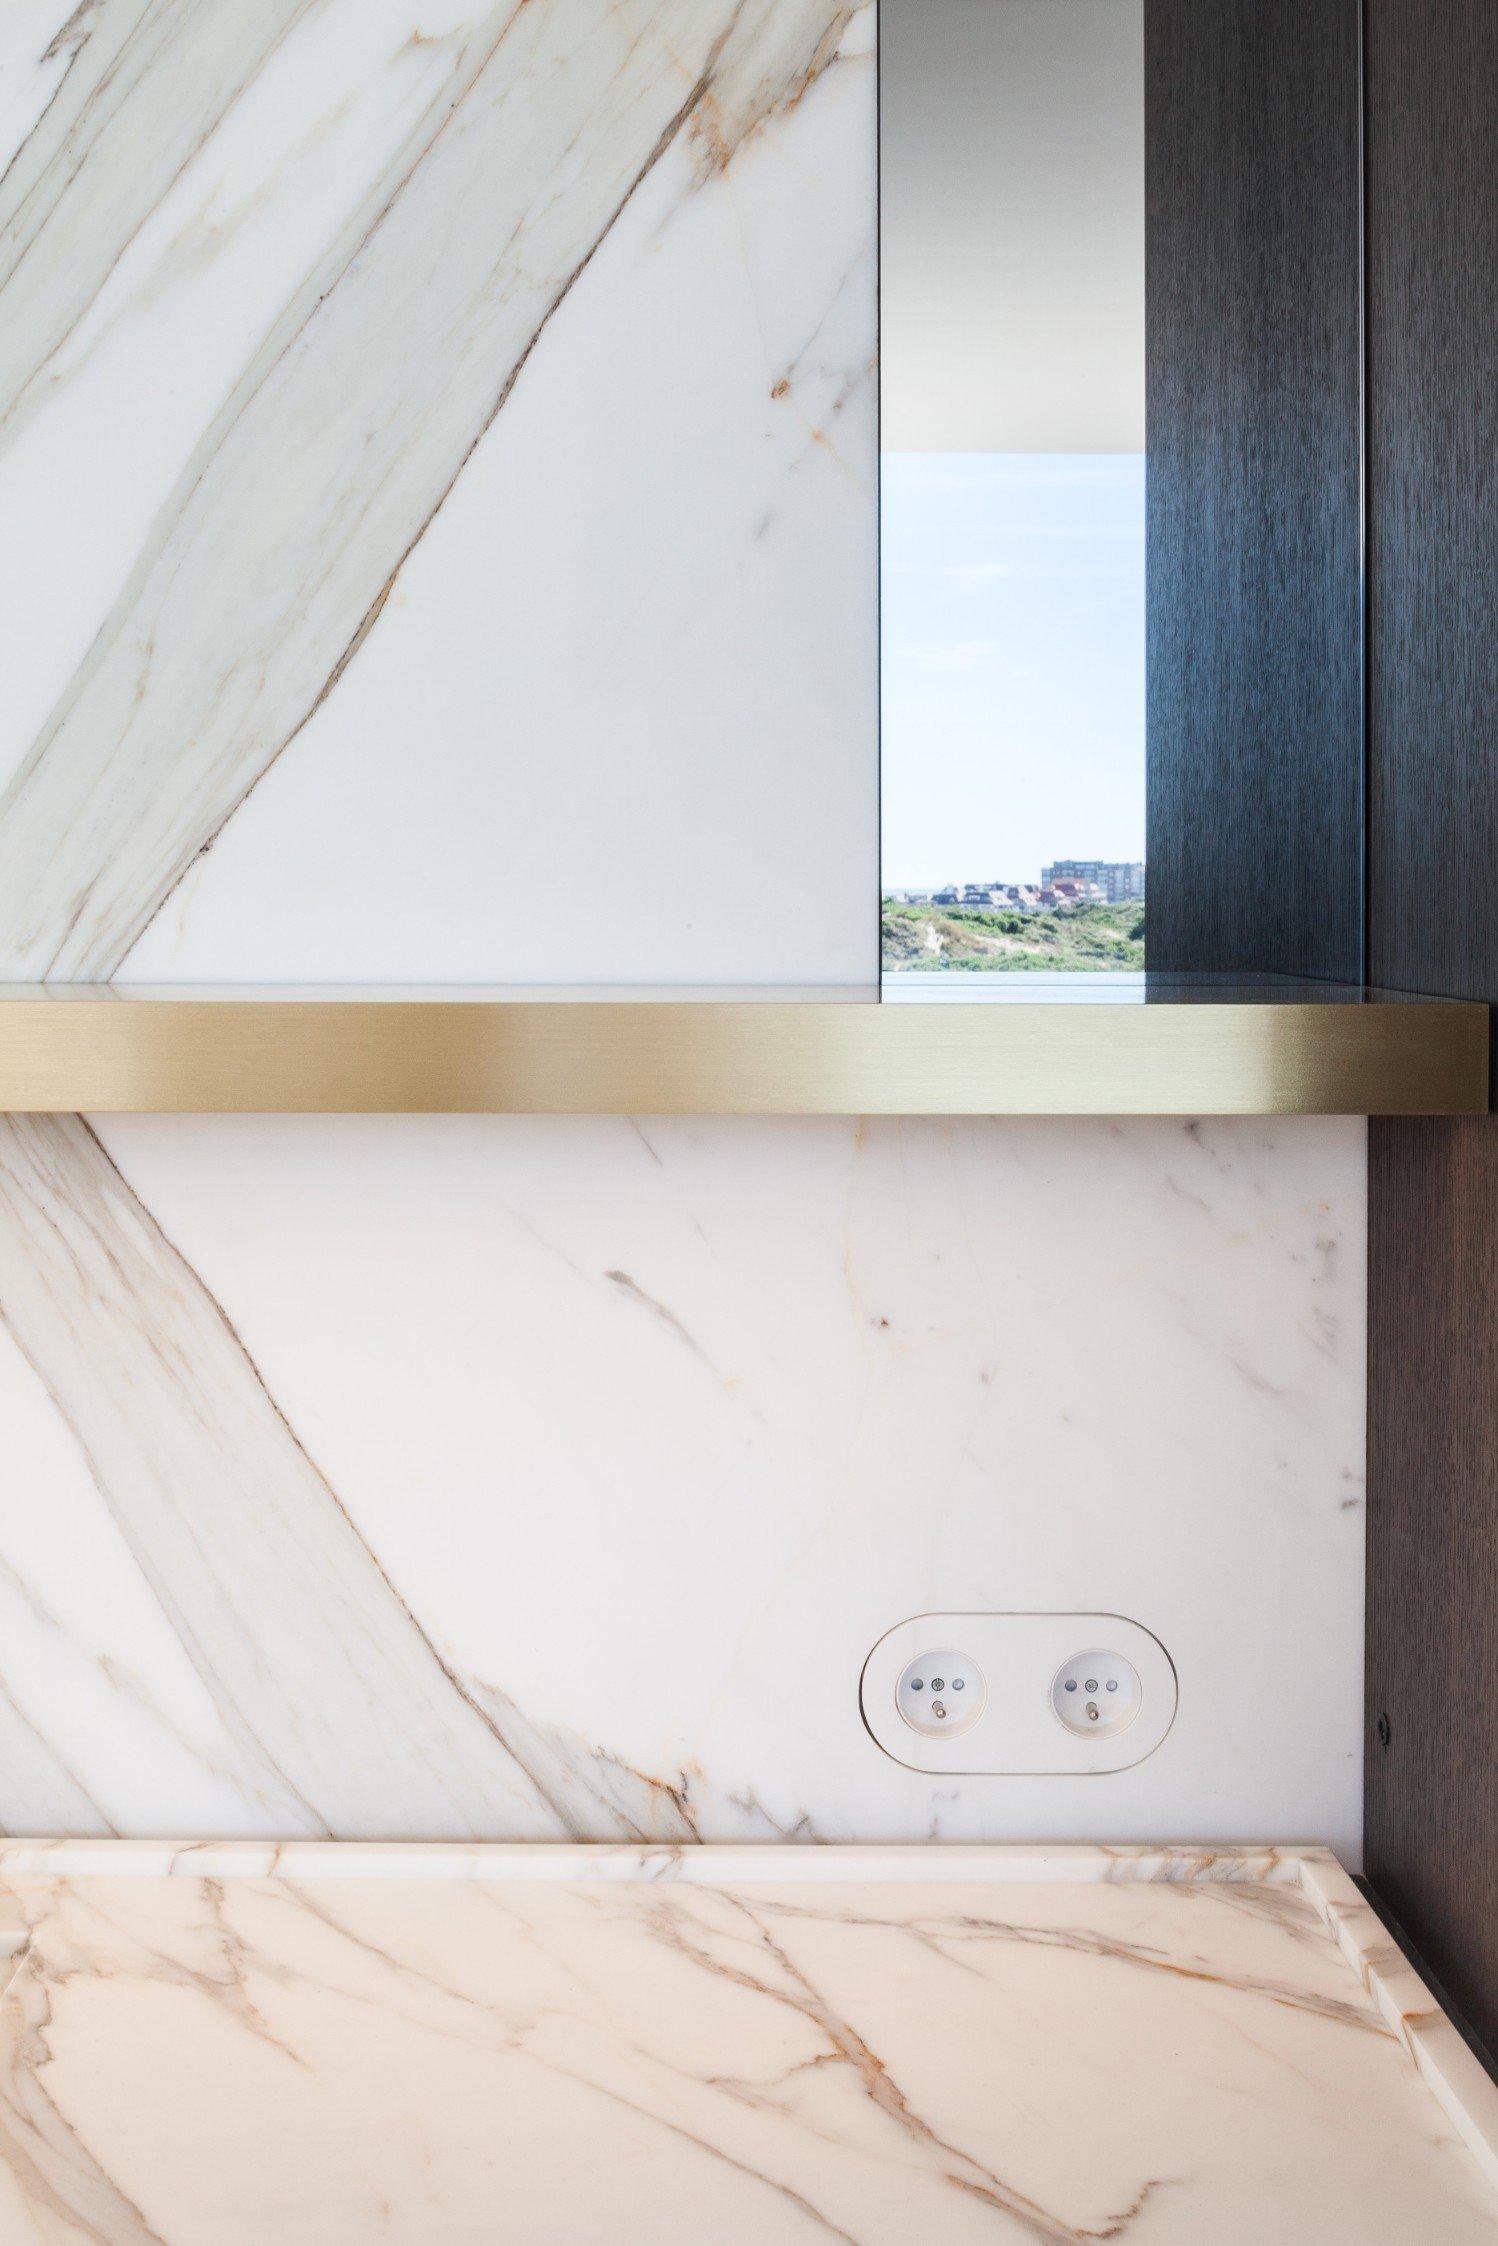 Rietveldprojects-penthouse-appartement-design-architectuur-kust35